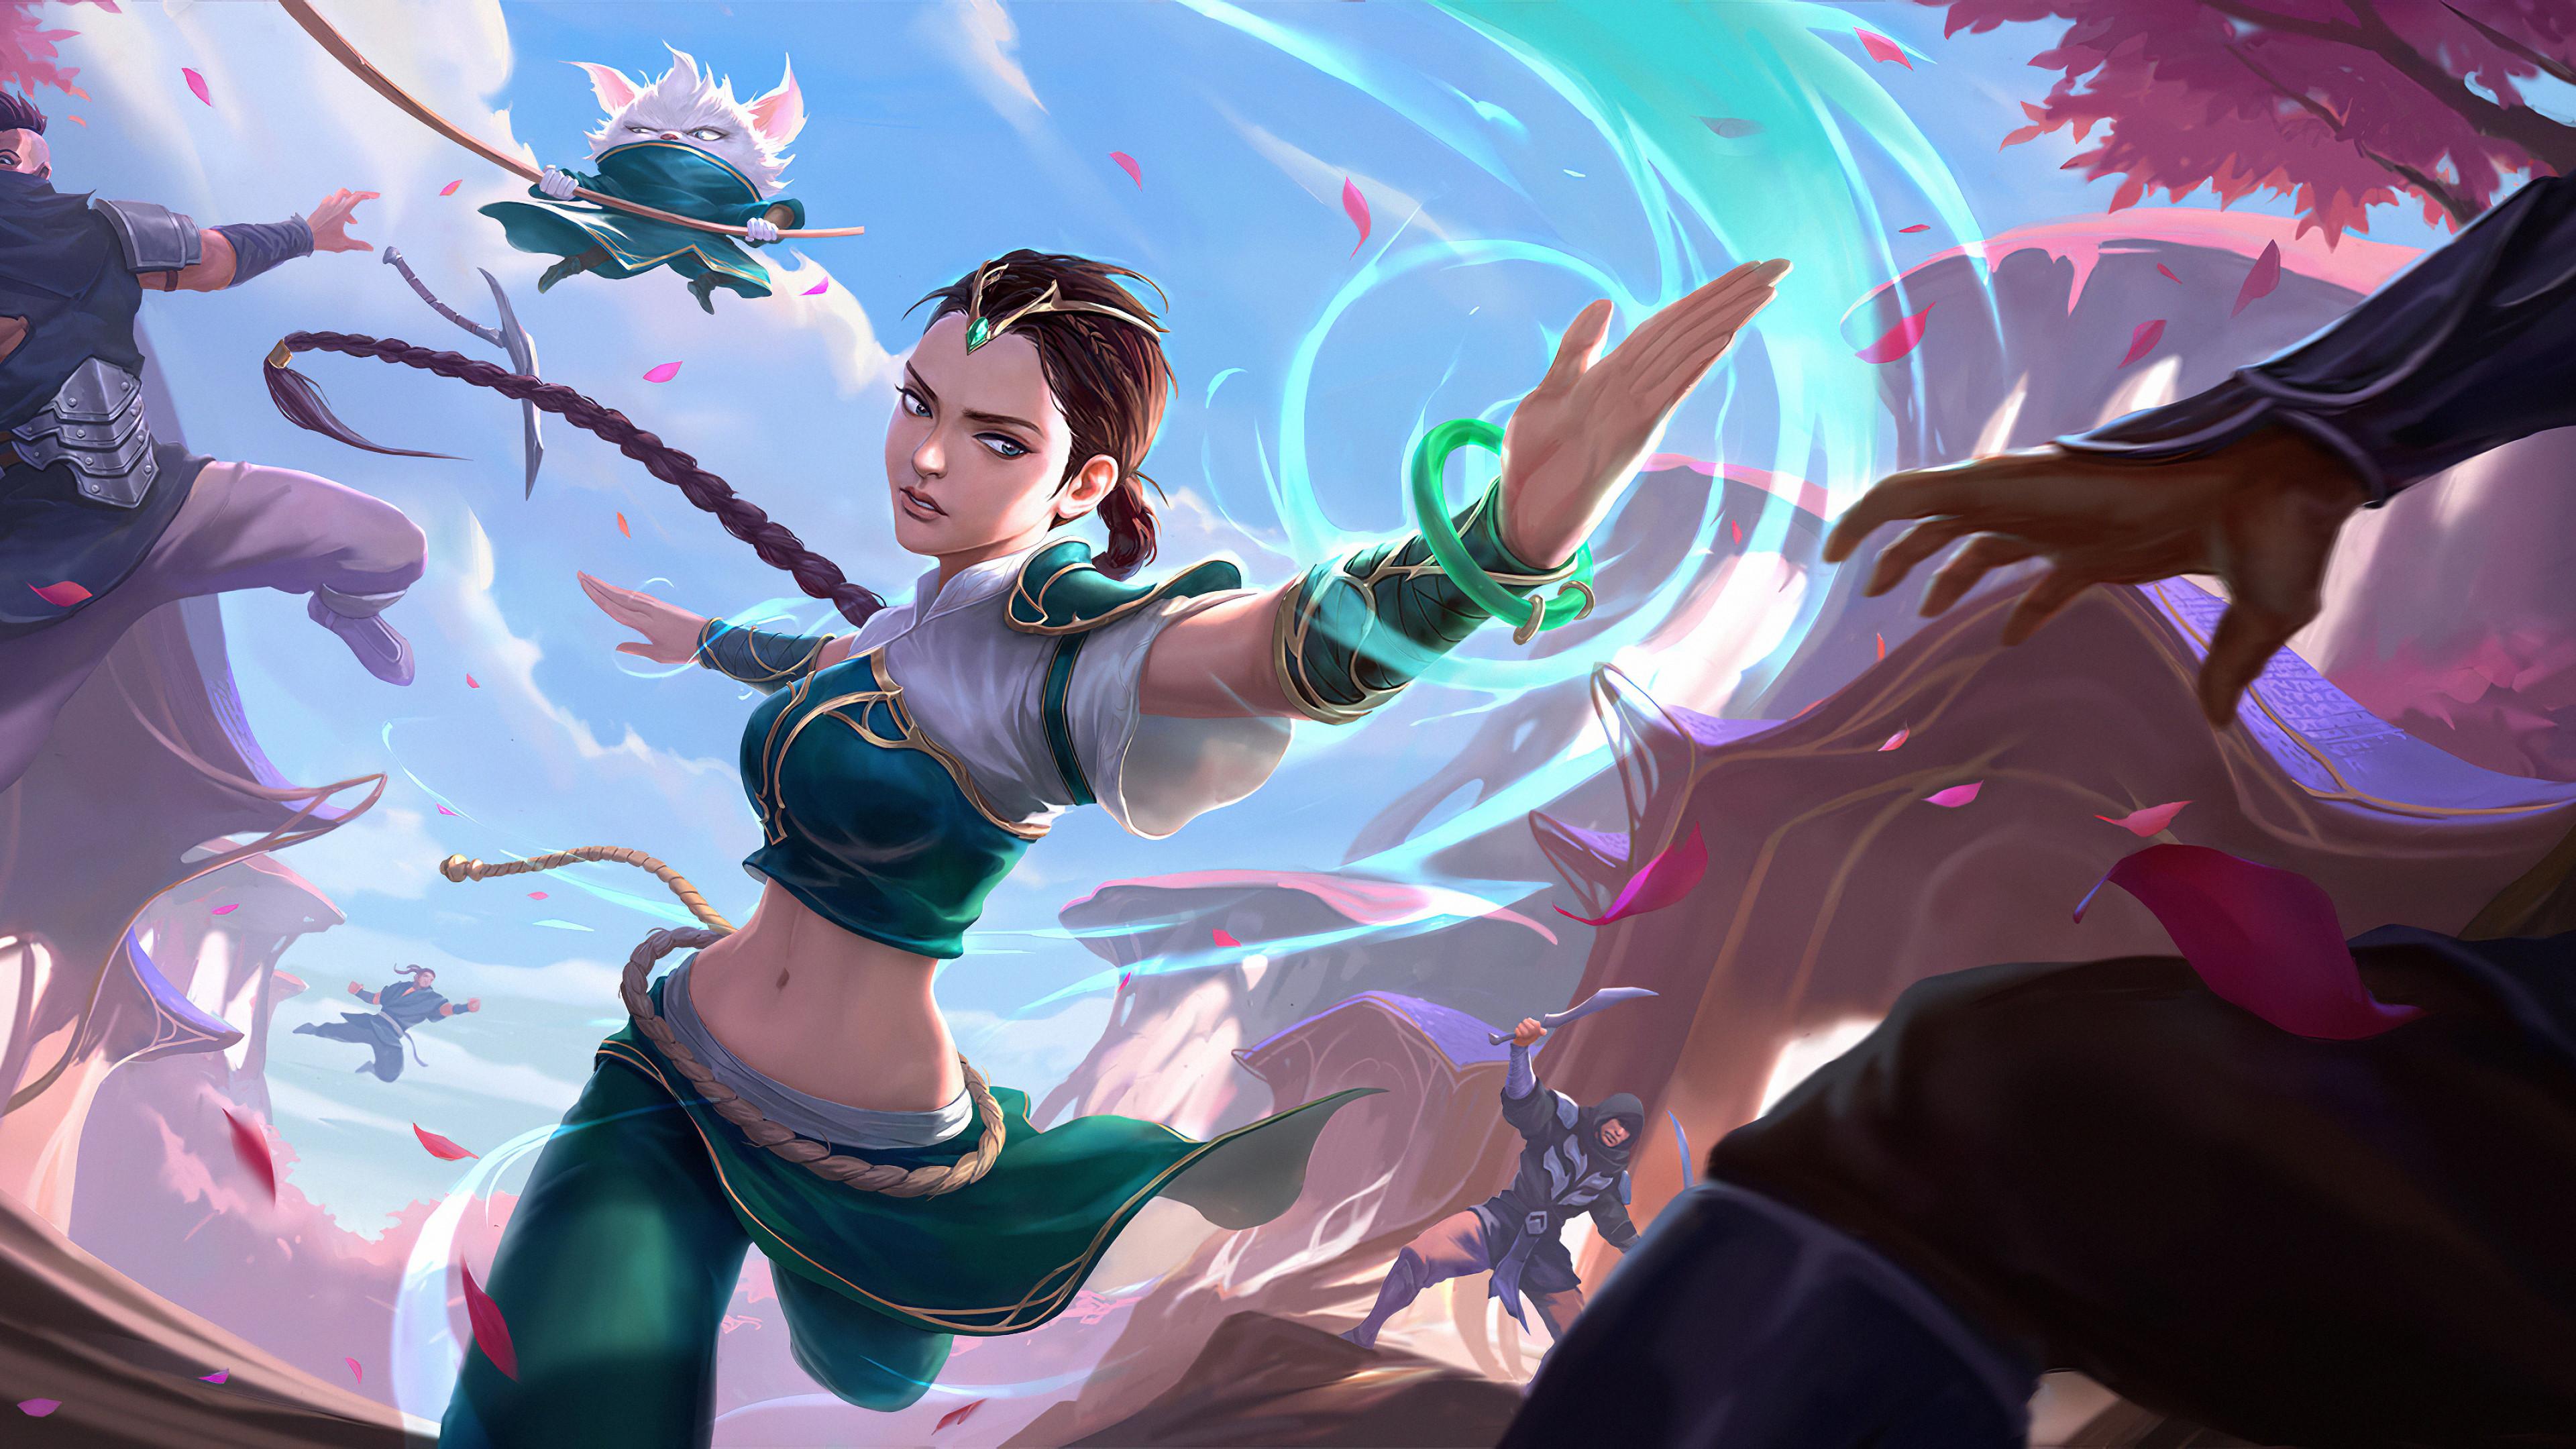 runterra league of legends 4k 3840x2160 1 - Runeterra League Of Legends - Runeterra wallpapers 4k lol, Runeterra League Of Legends wallpapers